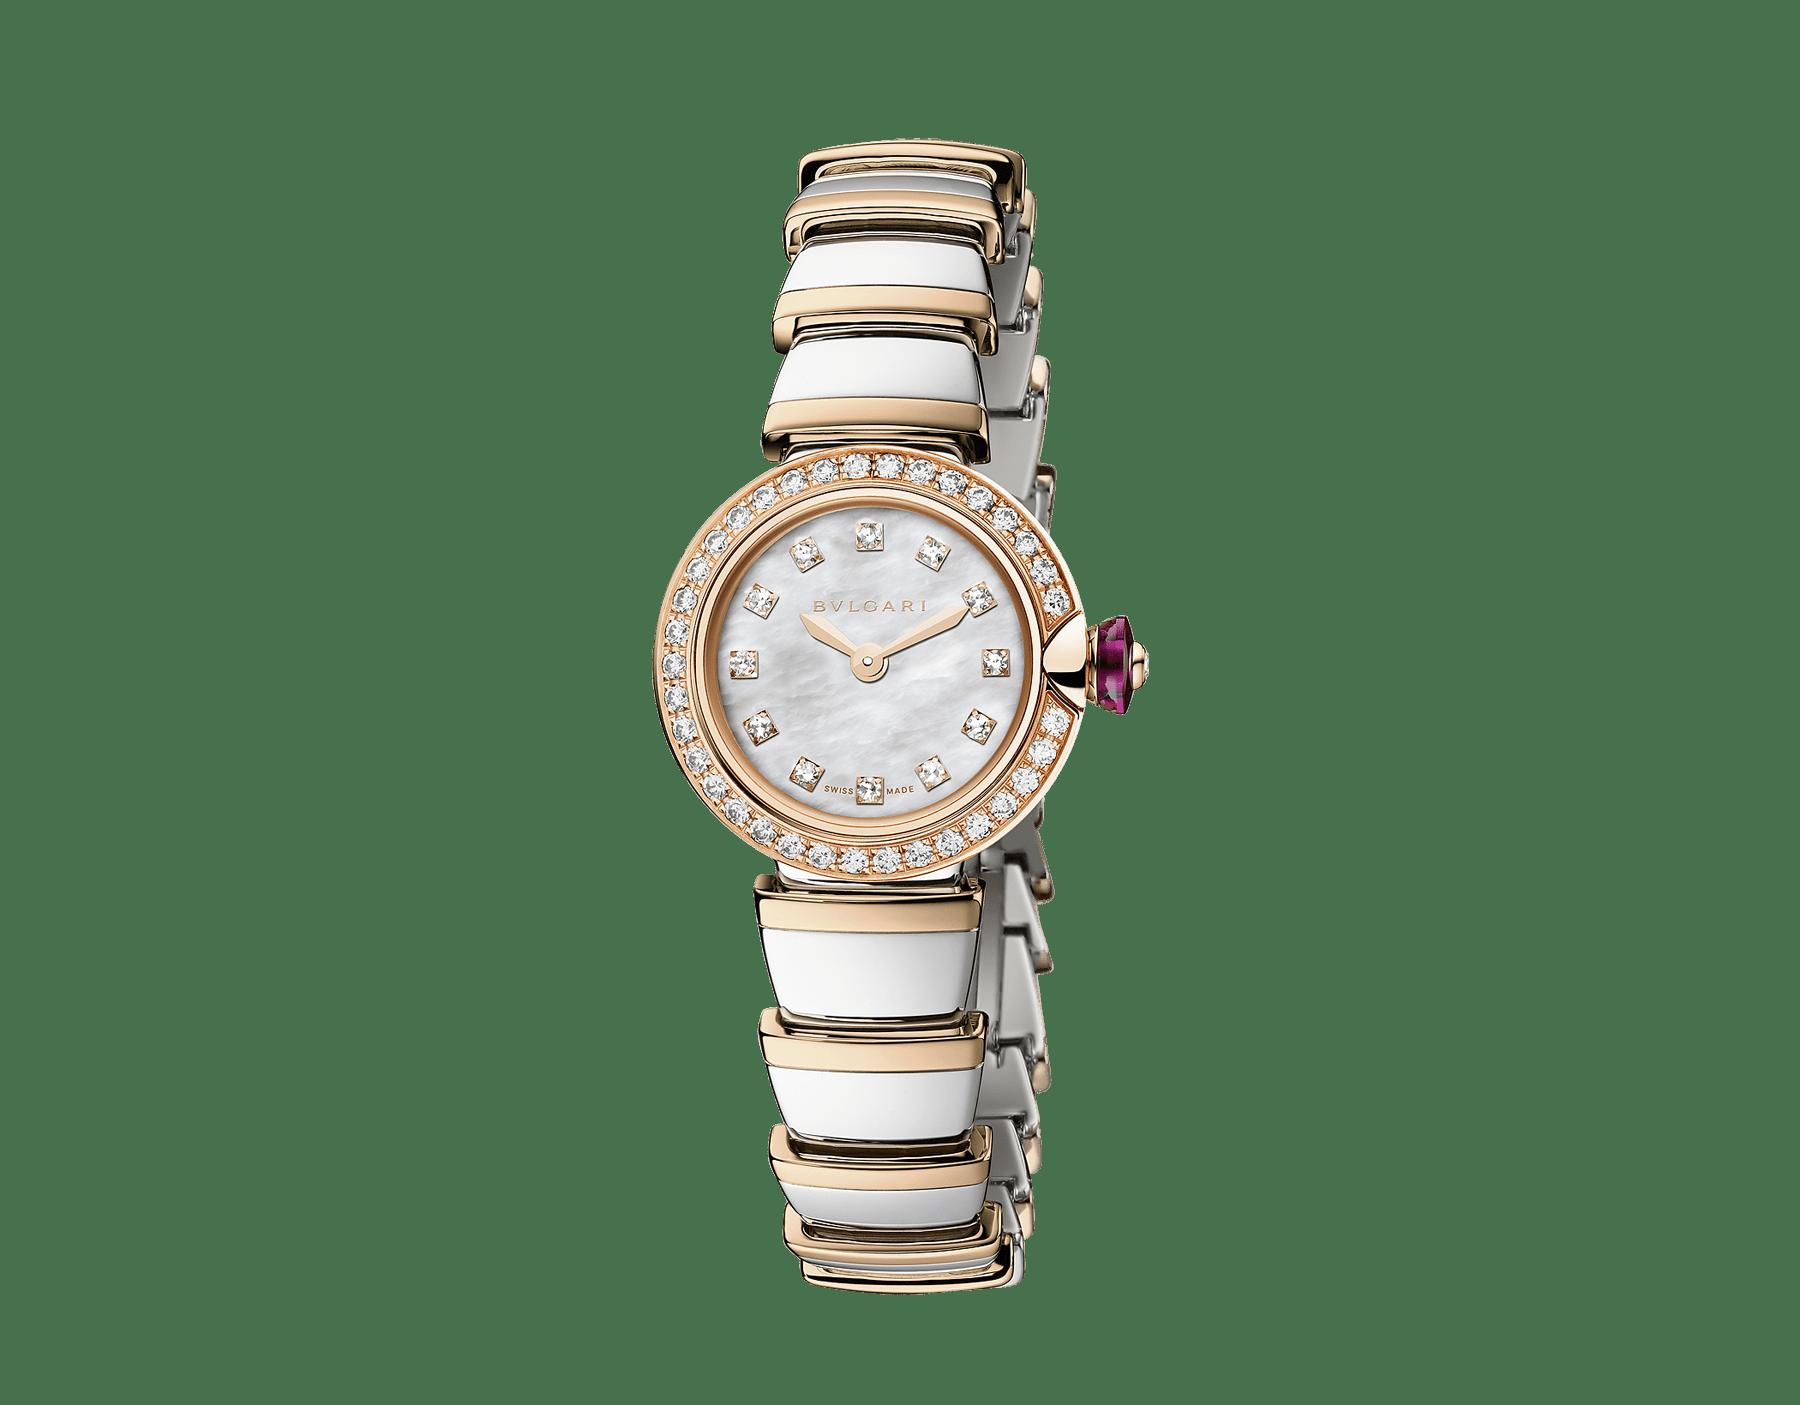 Piccola Lvcea 腕錶,精鋼錶殼,18K 玫瑰金錶圈鑲飾明亮型切割鑽石,白色珍珠母貝錶盤,鑽石時標,18K 玫瑰金和精鋼錶帶。 103049 image 1